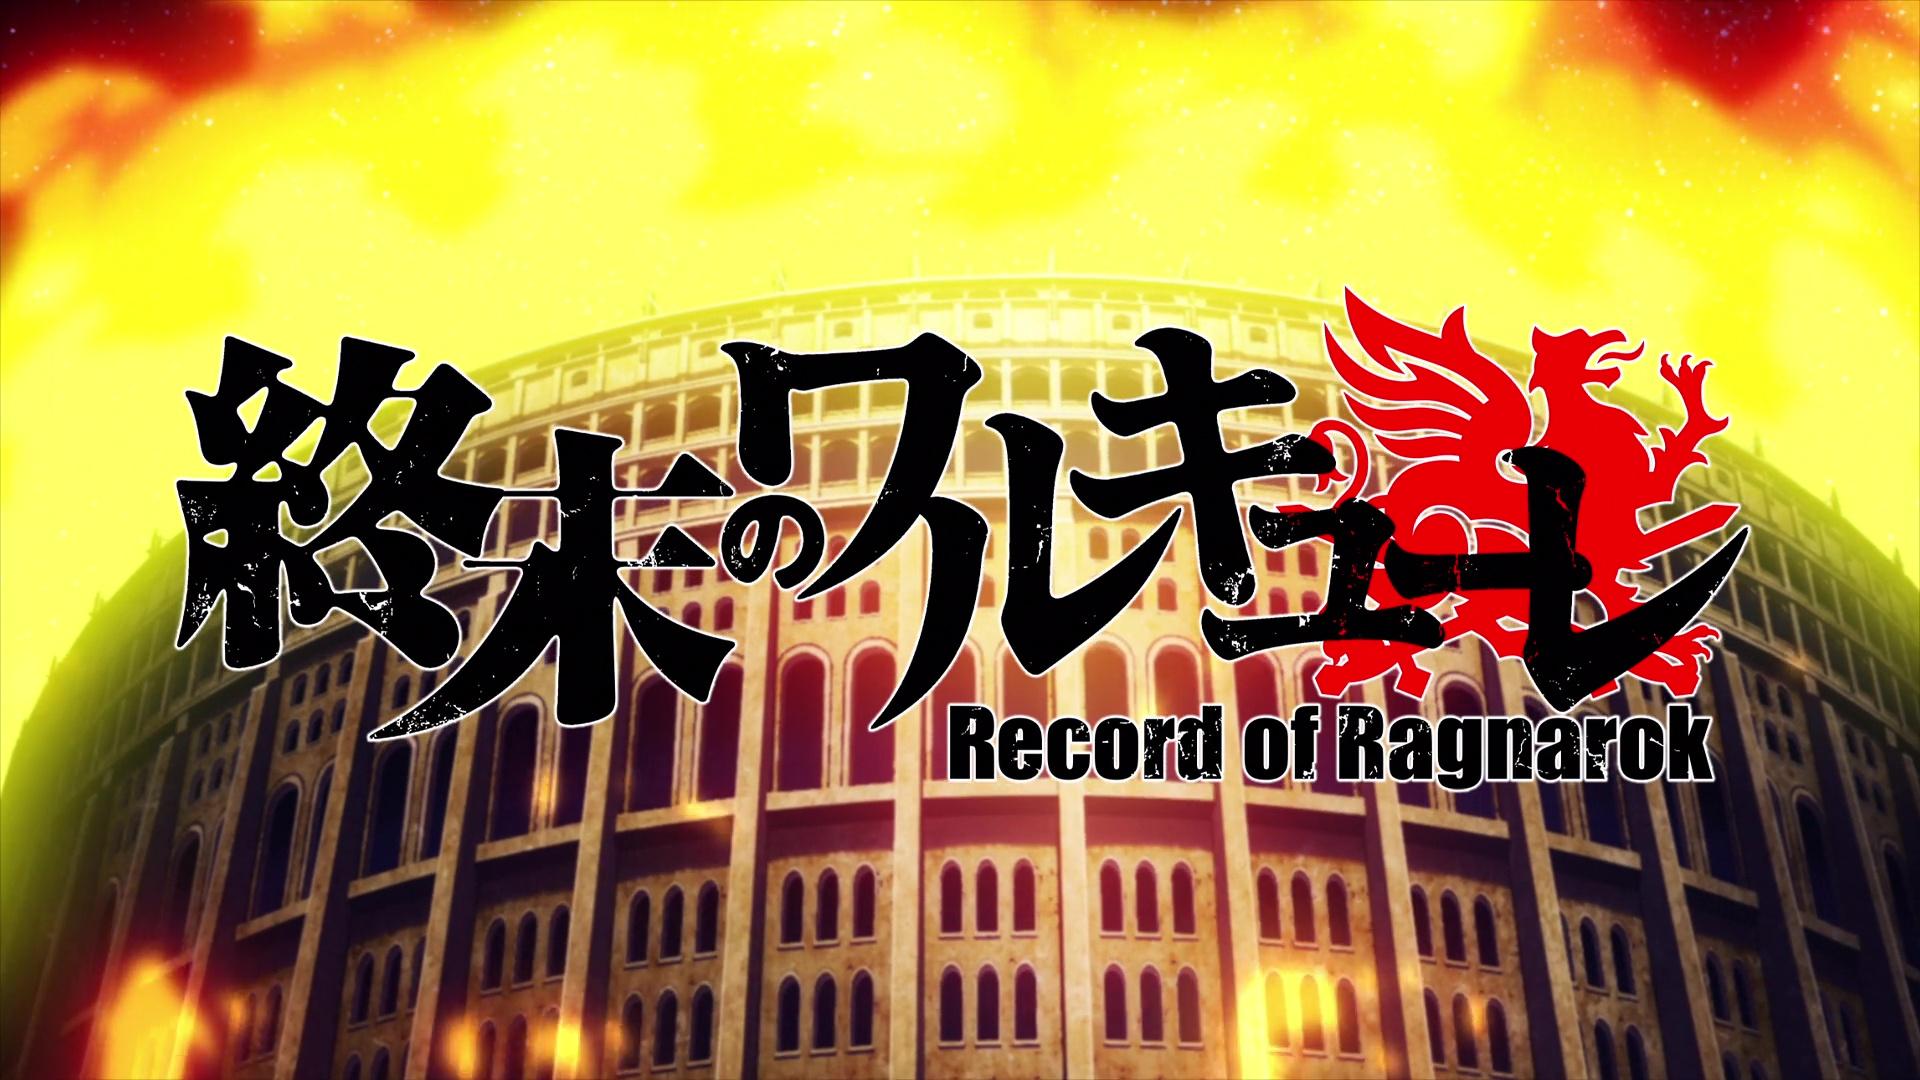 Record of Ragnarok (2021) Temporada 1 1080p WEB-DL Latino